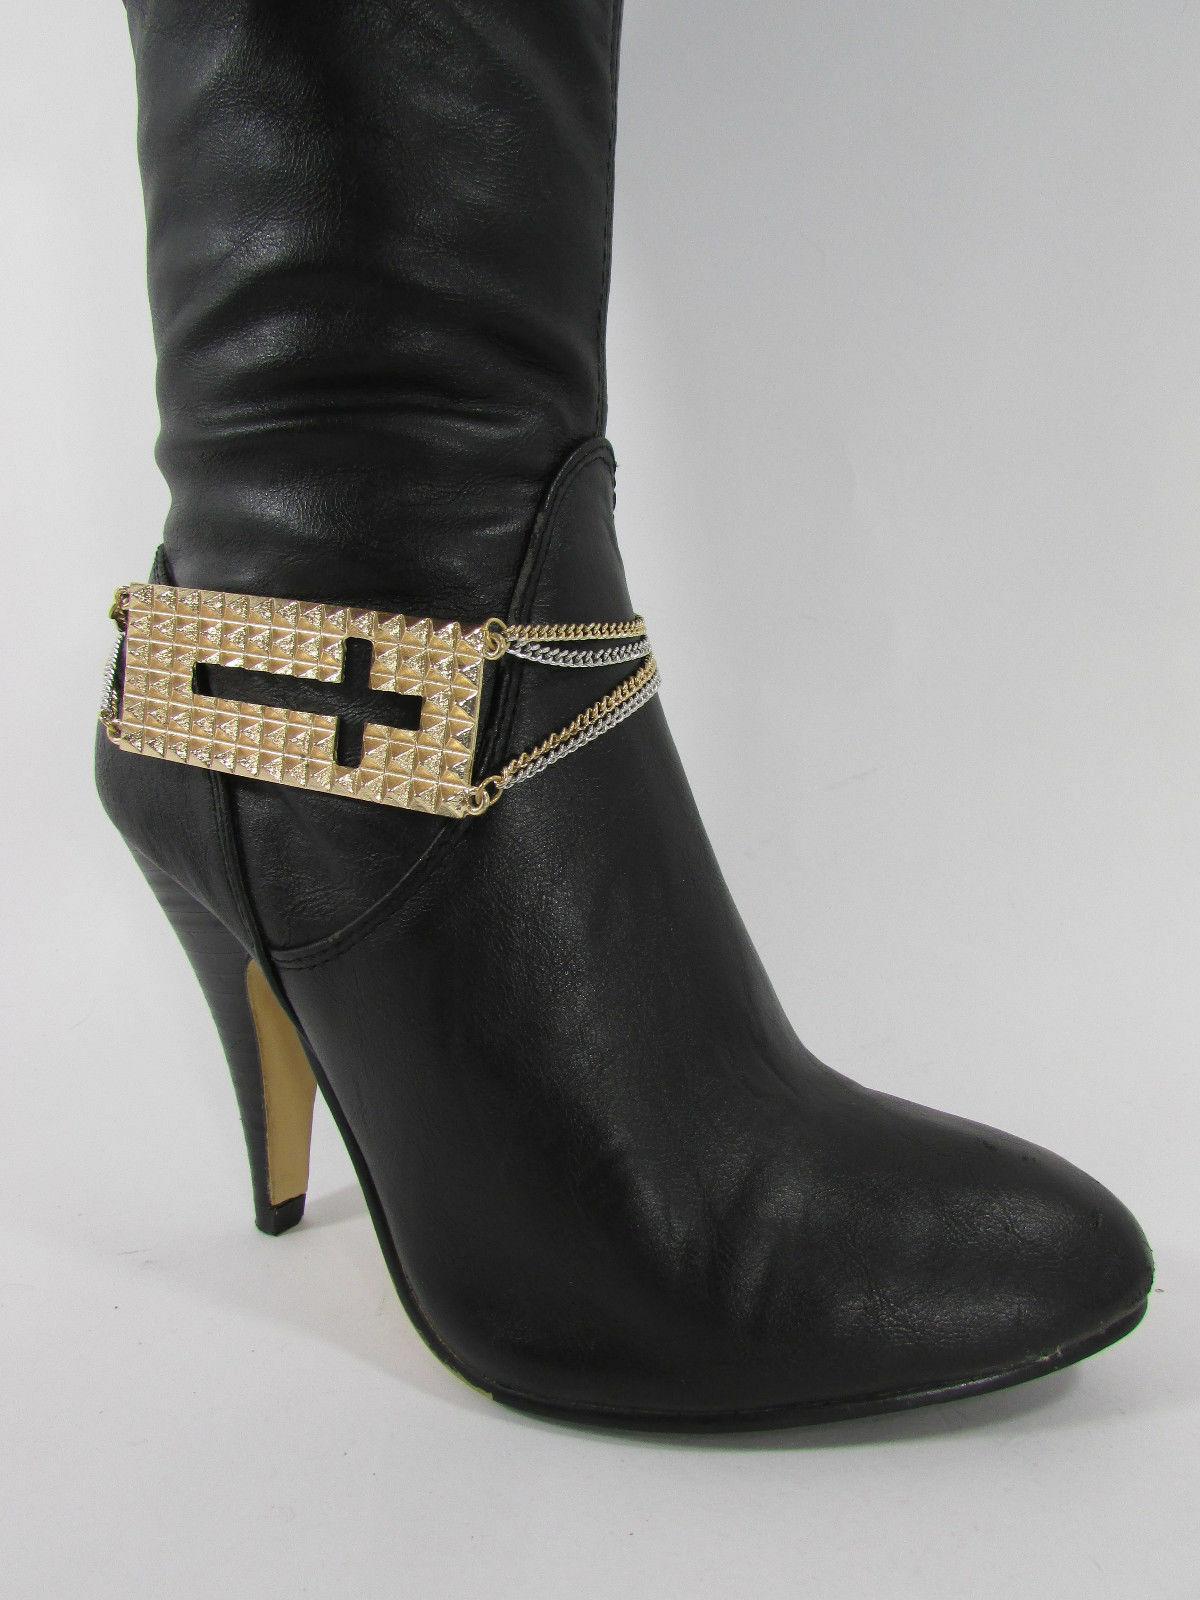 Mujer Moda Joyería Bota Brazalete Oro Placa Cruz Cadenas Zapato Bling Charm image 5